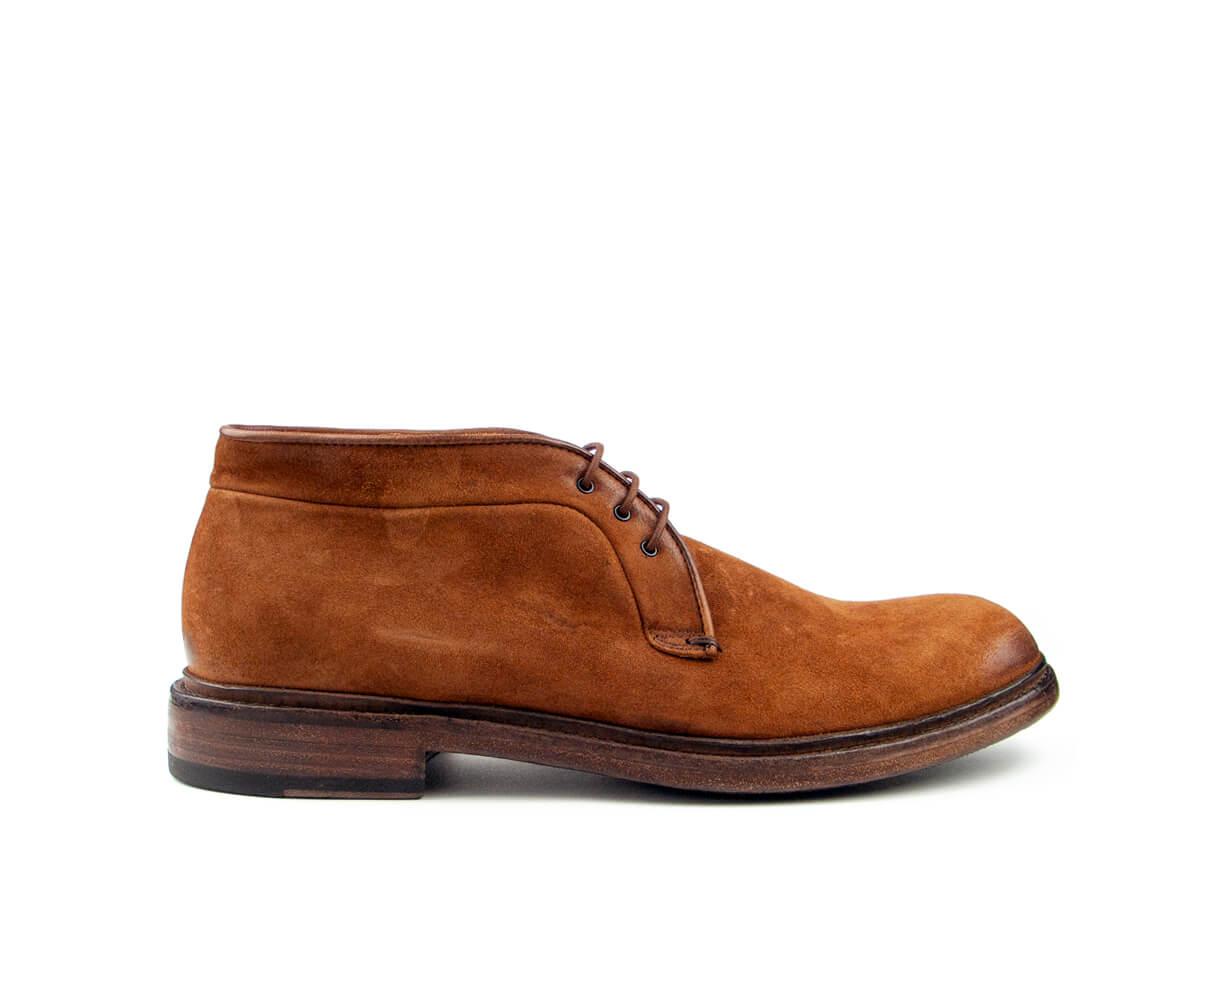 017 ecla scarpe rgb